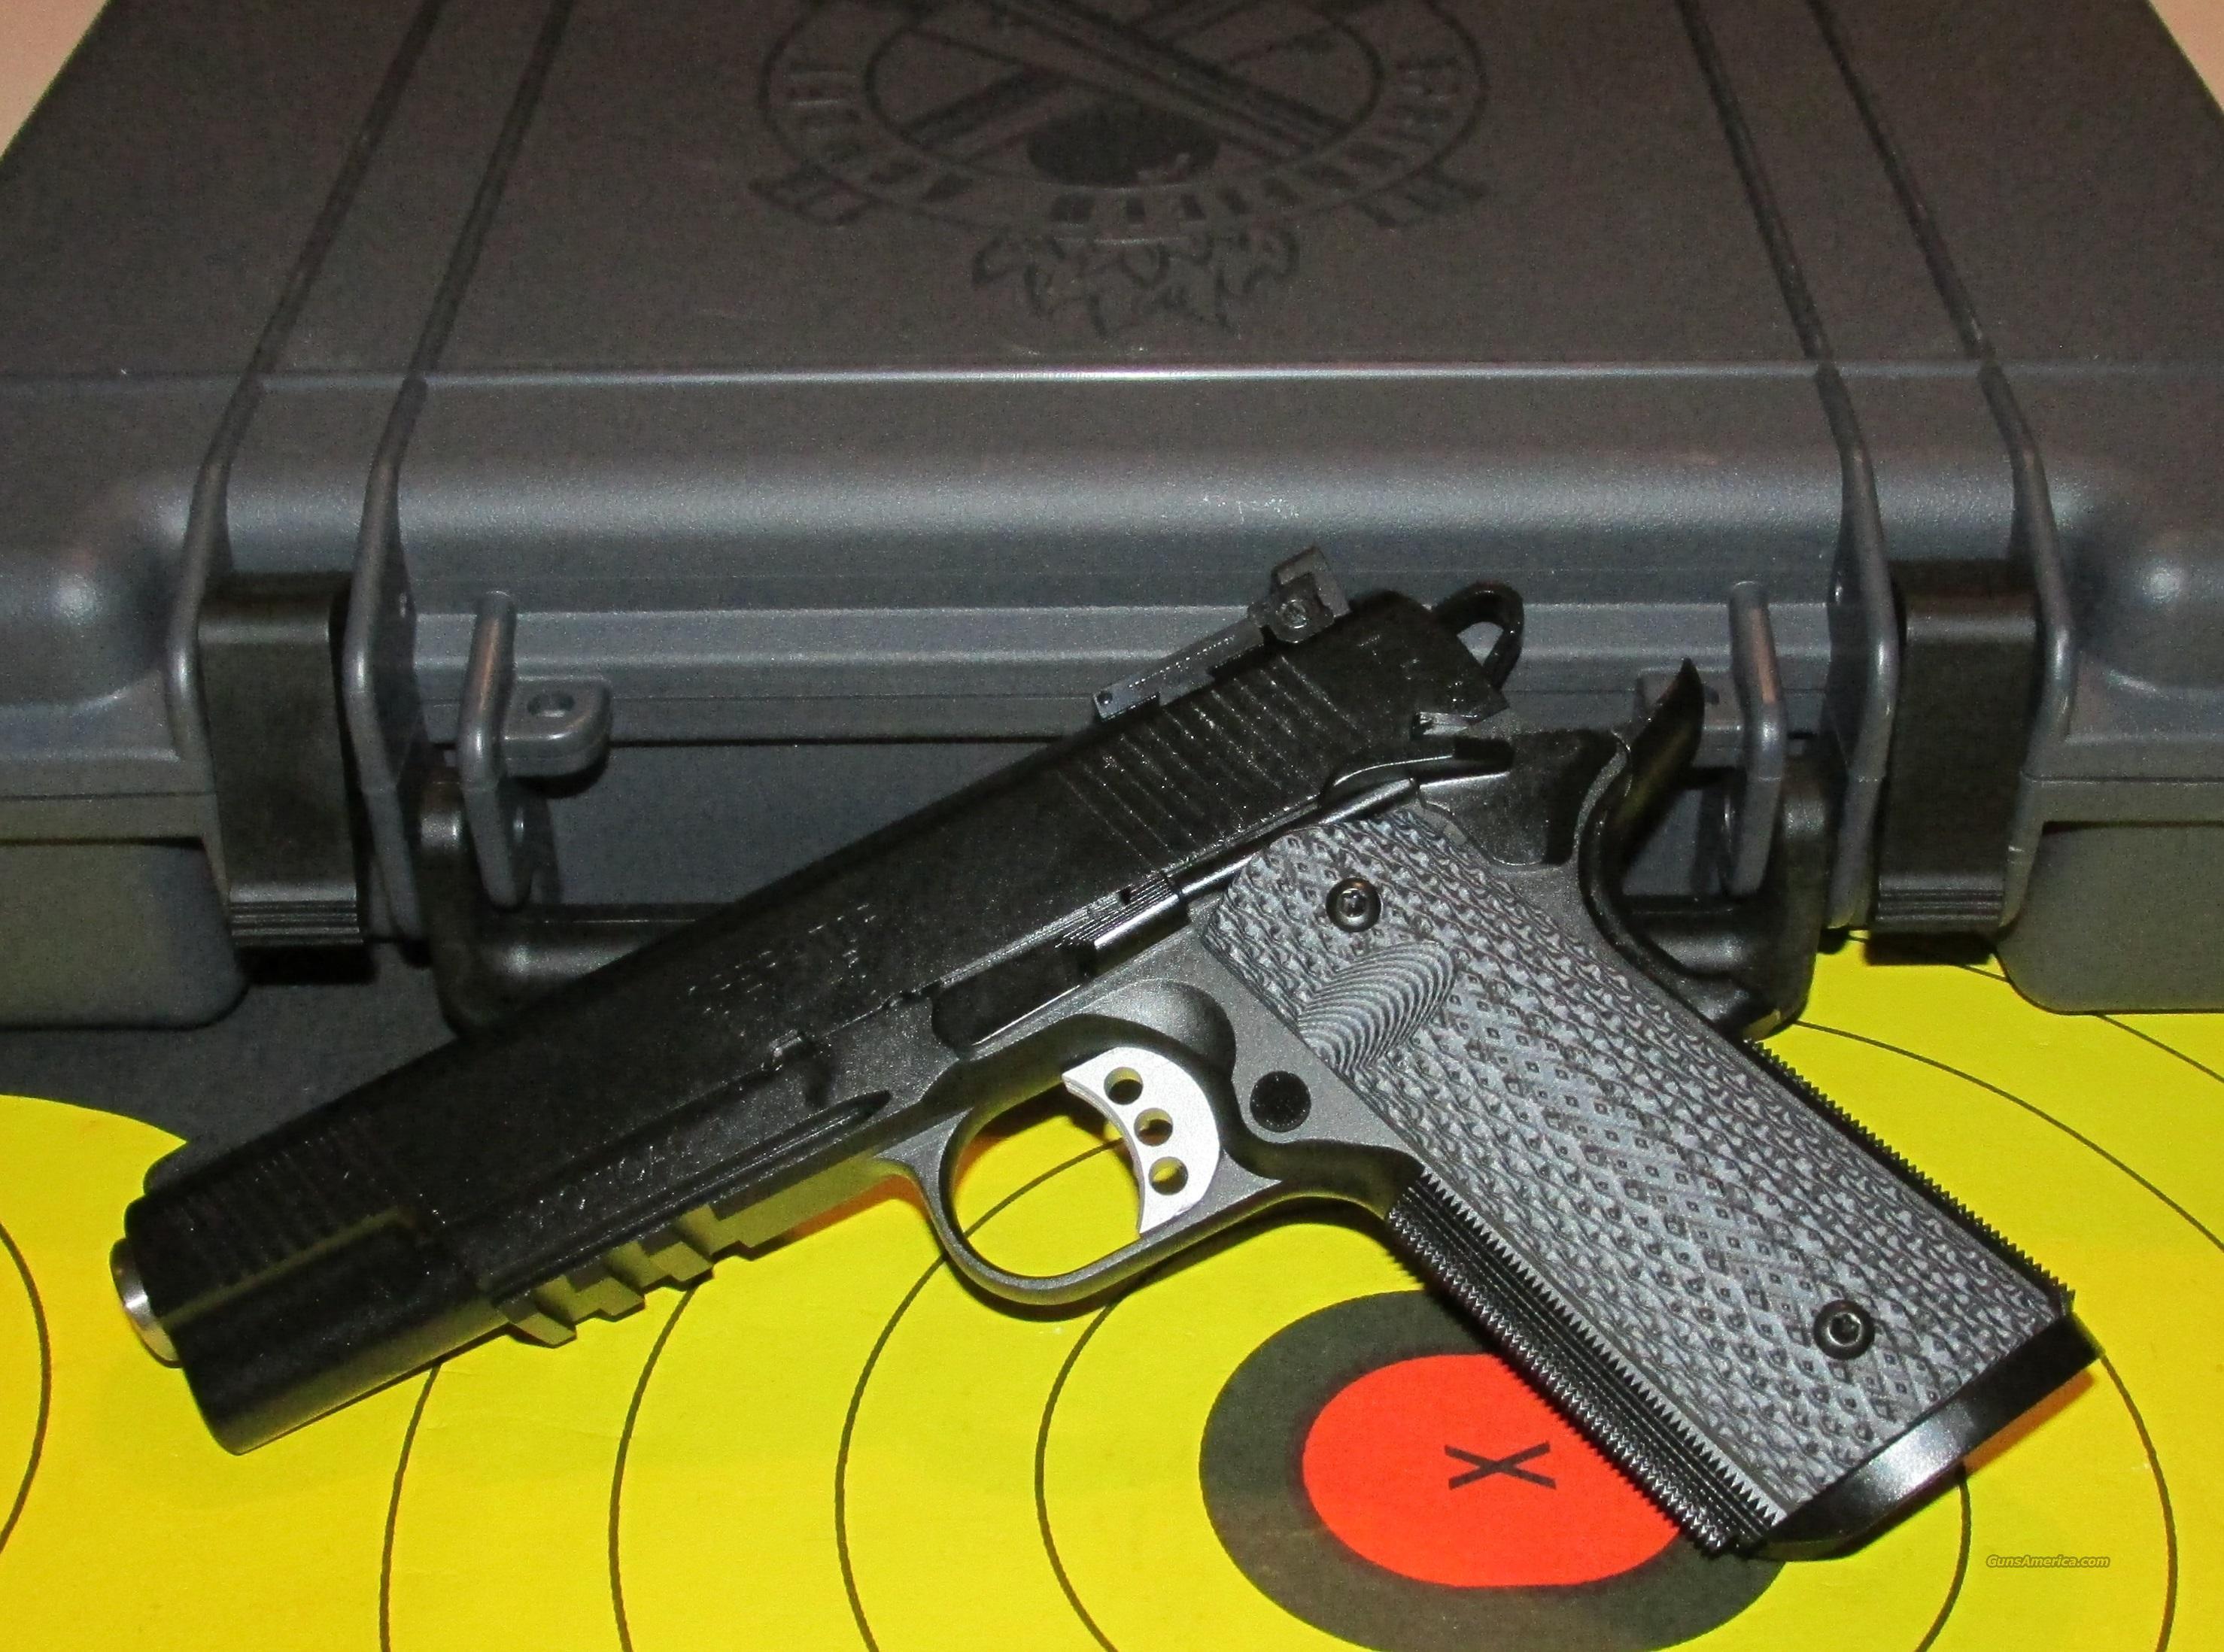 Springfield 1911 TRP Operator 45 Pistol  Guns > Pistols > Springfield Armory Pistols > 1911 Type